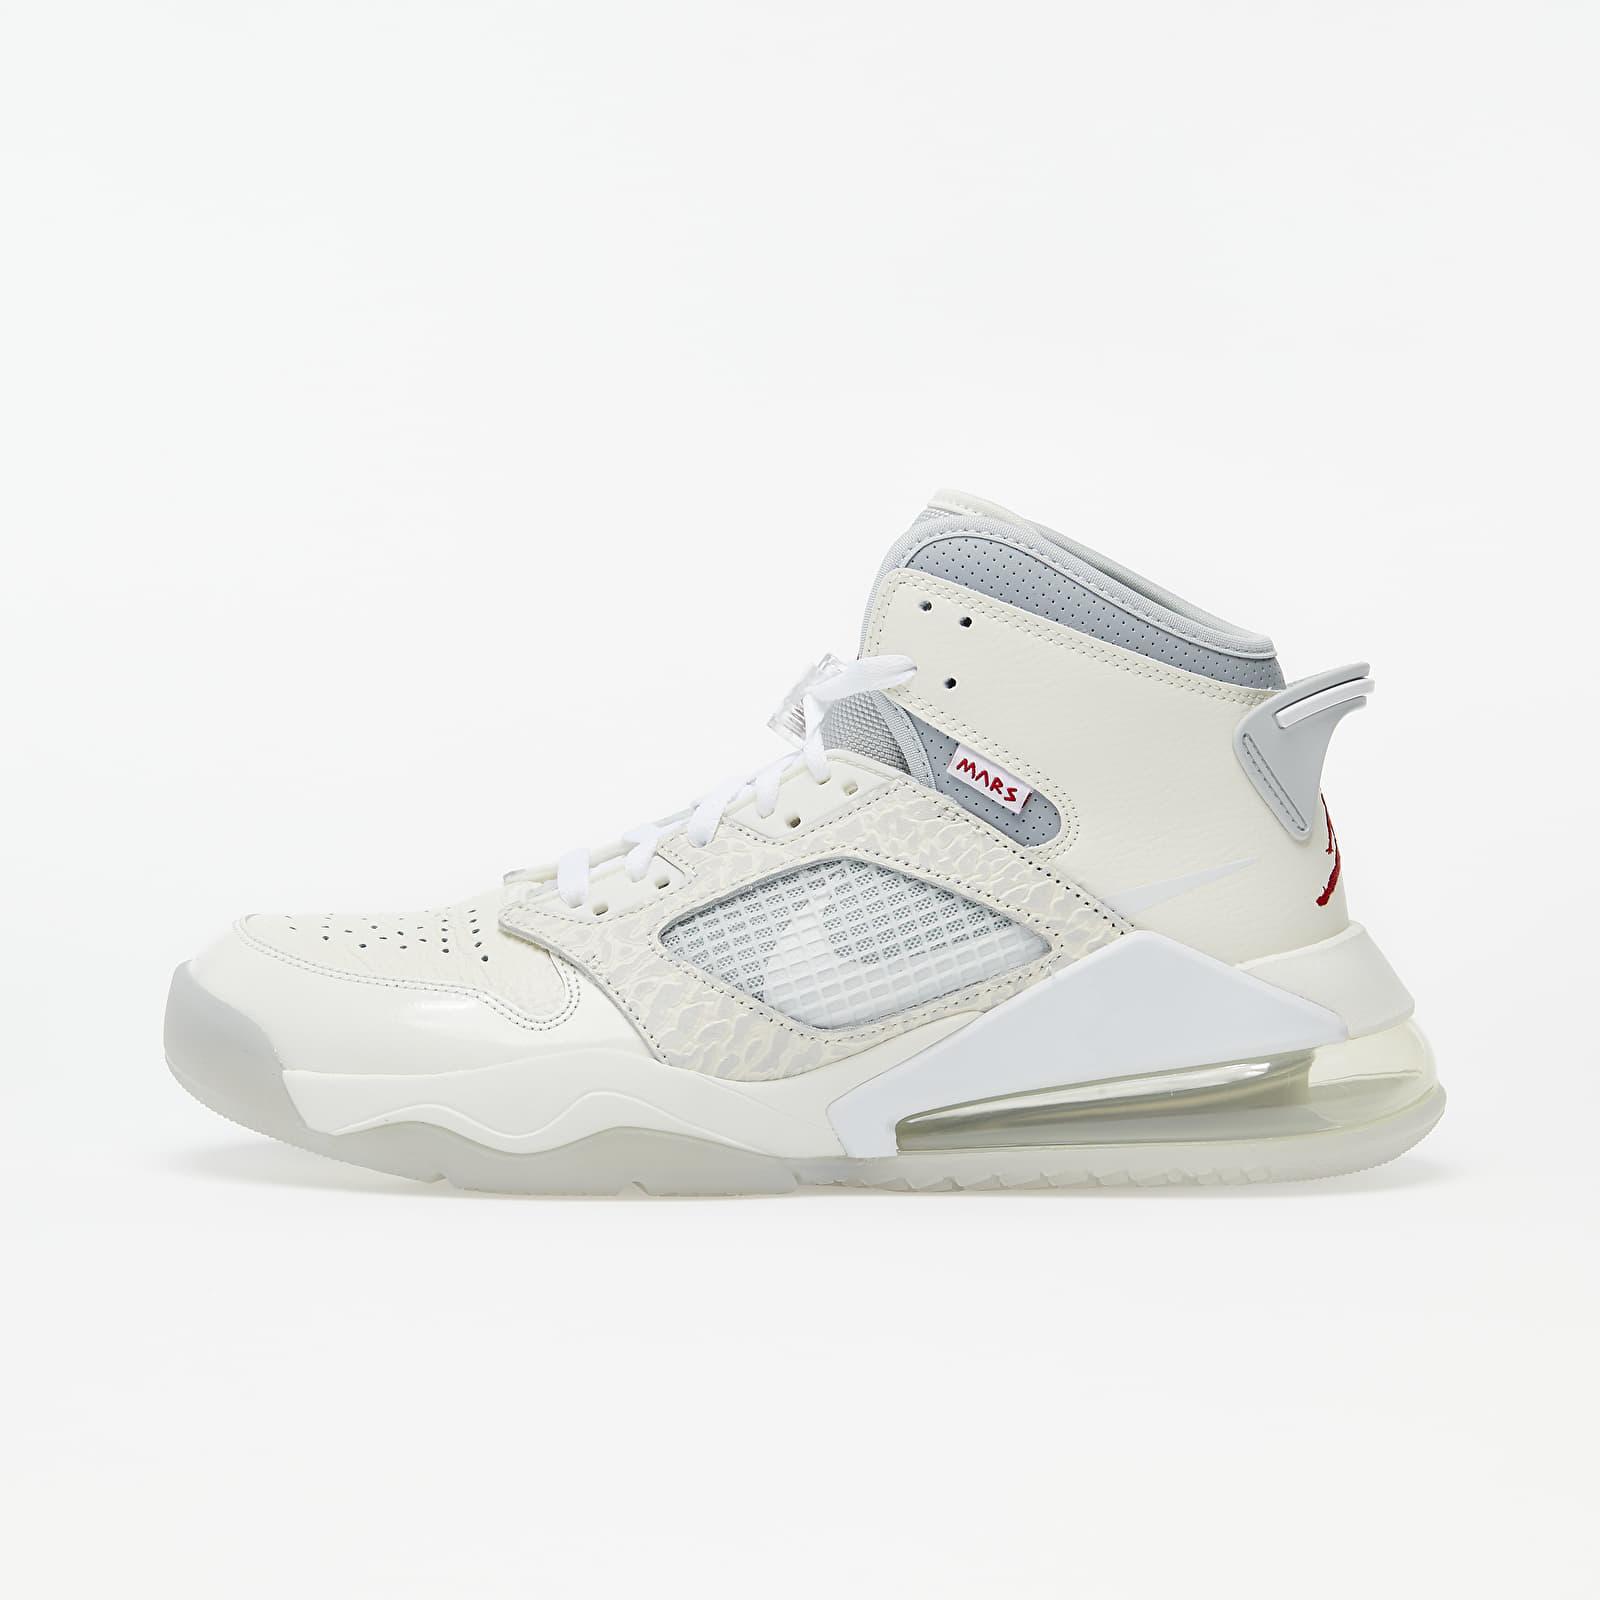 Zapatillas Hombre Jordan Mars 270 Sail/ White-Pure Platinum-Wolf Grey